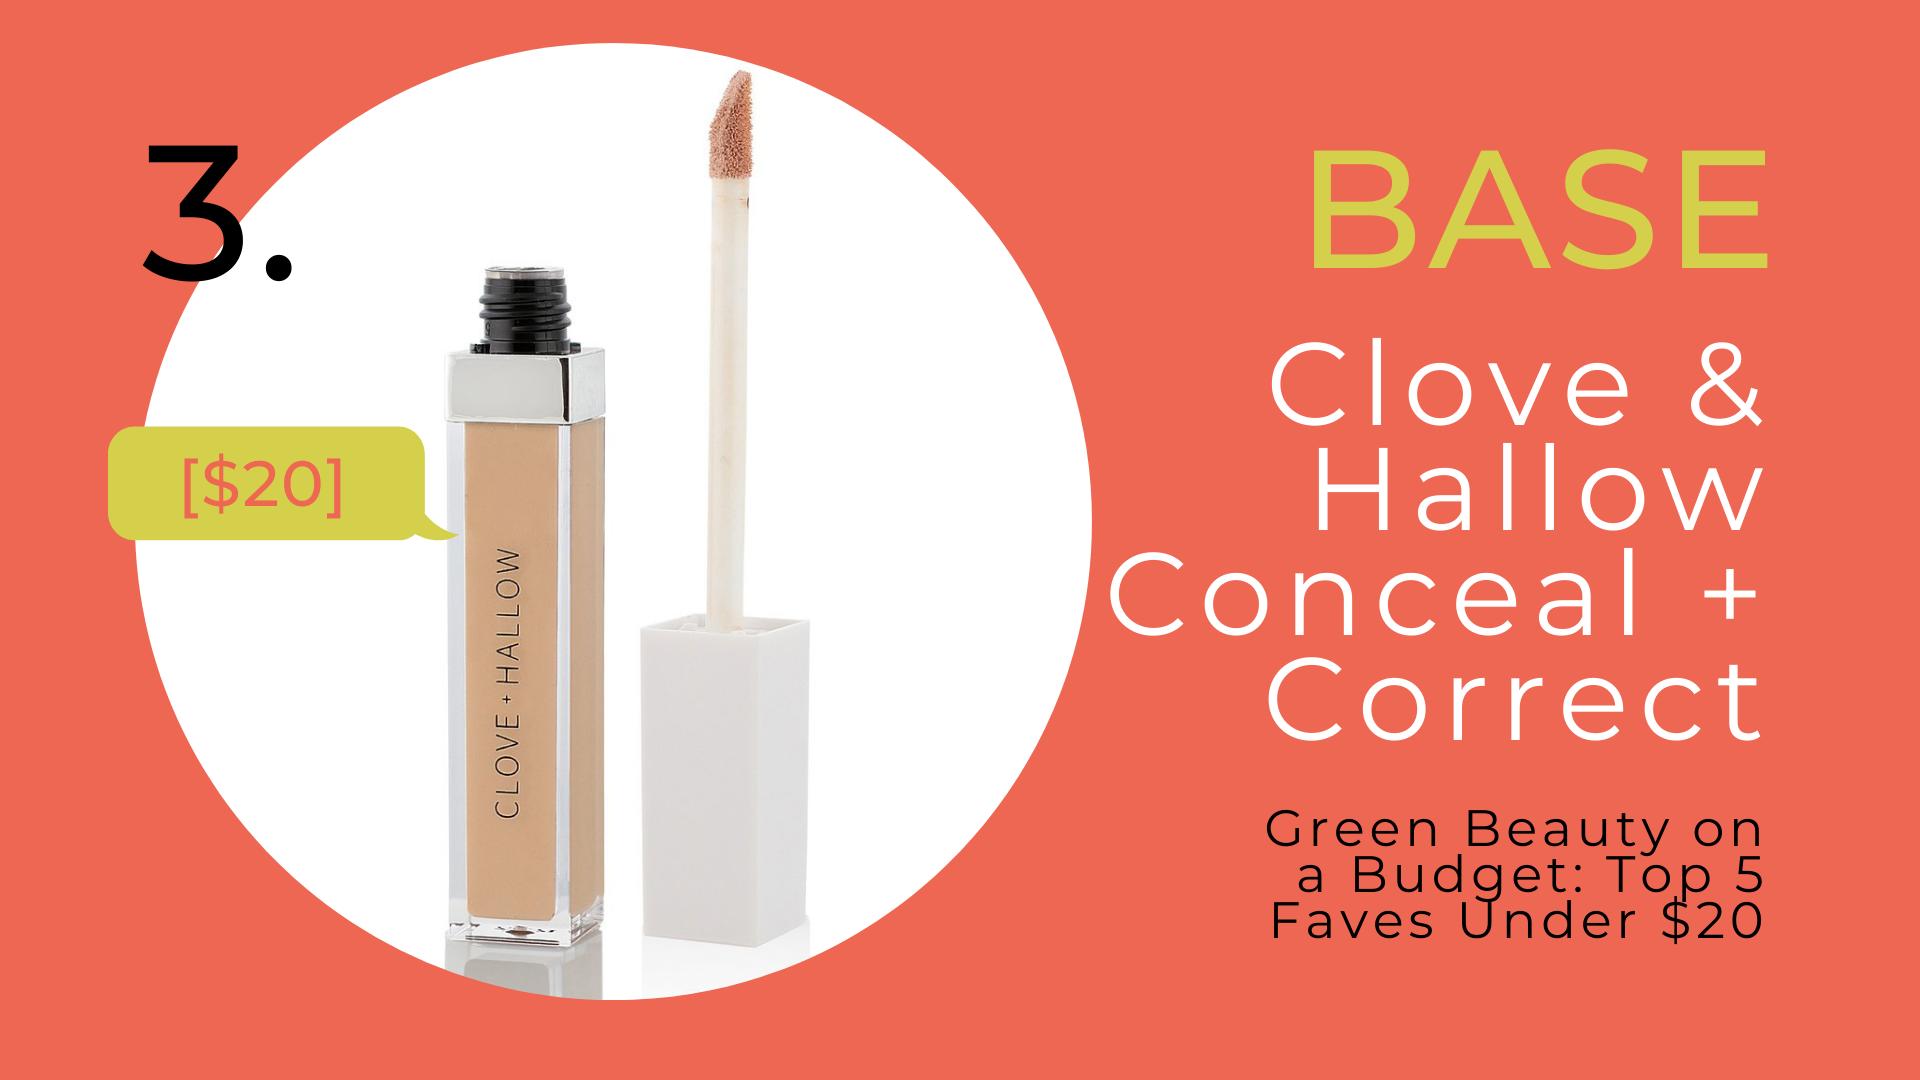 Shop Clove & Hallow Conceal + Correct